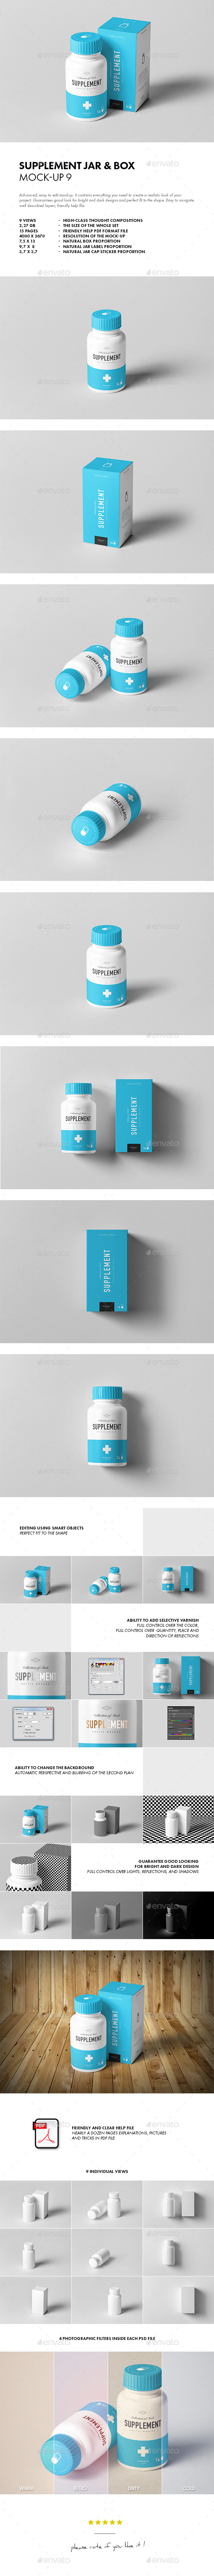 GraphicRiver Supplement Jar & Box Mock-up 9 20920870